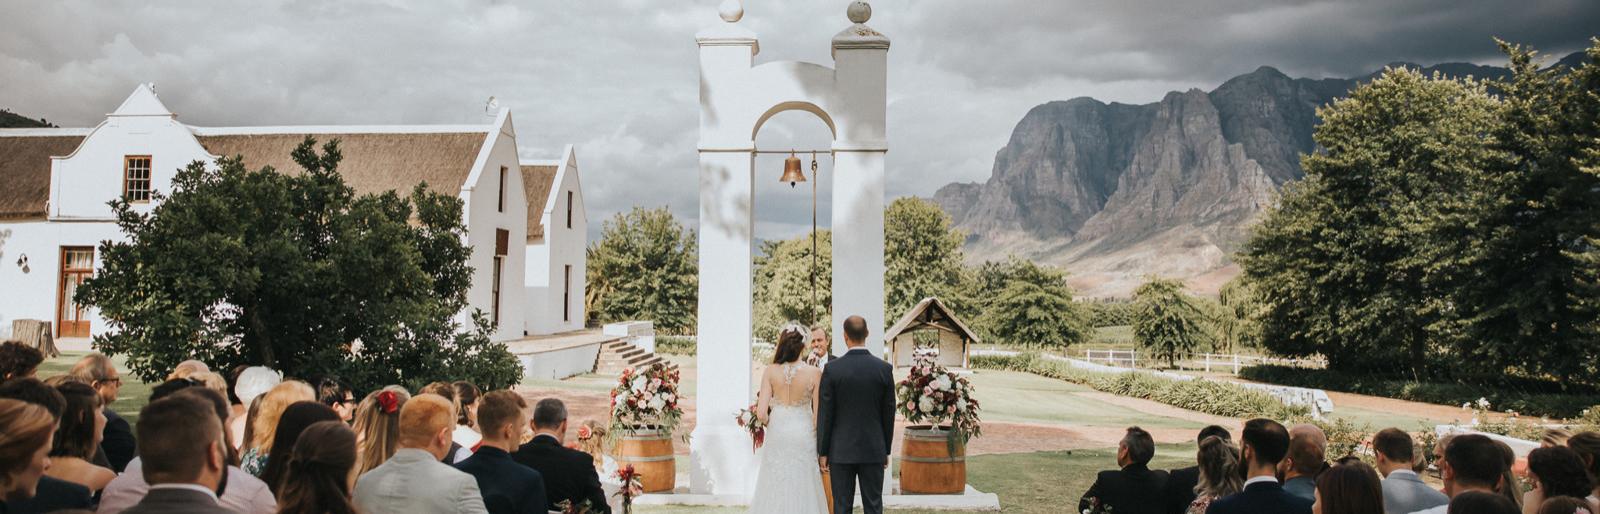 Zorgvliet Bespoke Wedding Package